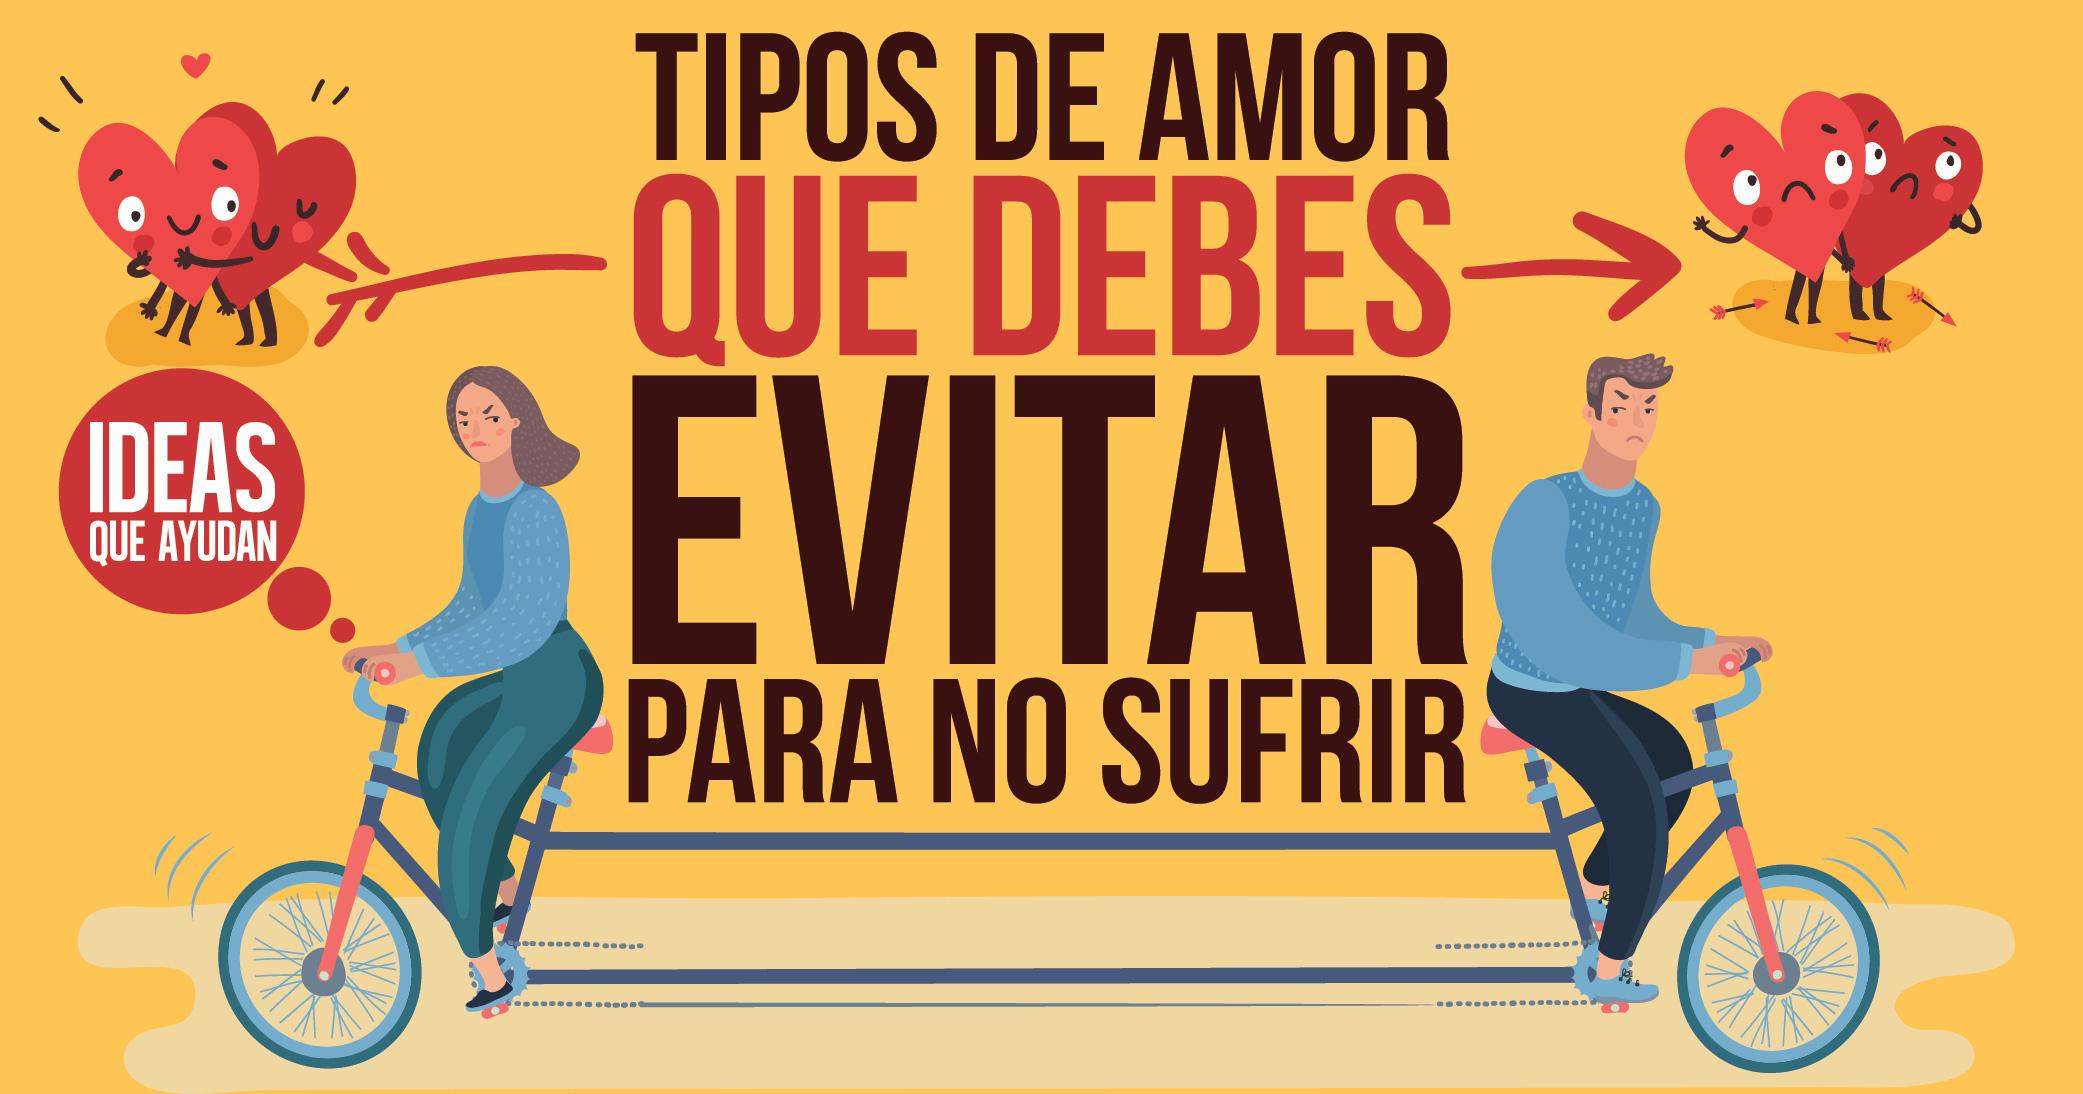 Tipos de amor que debes evitar para no sufrir